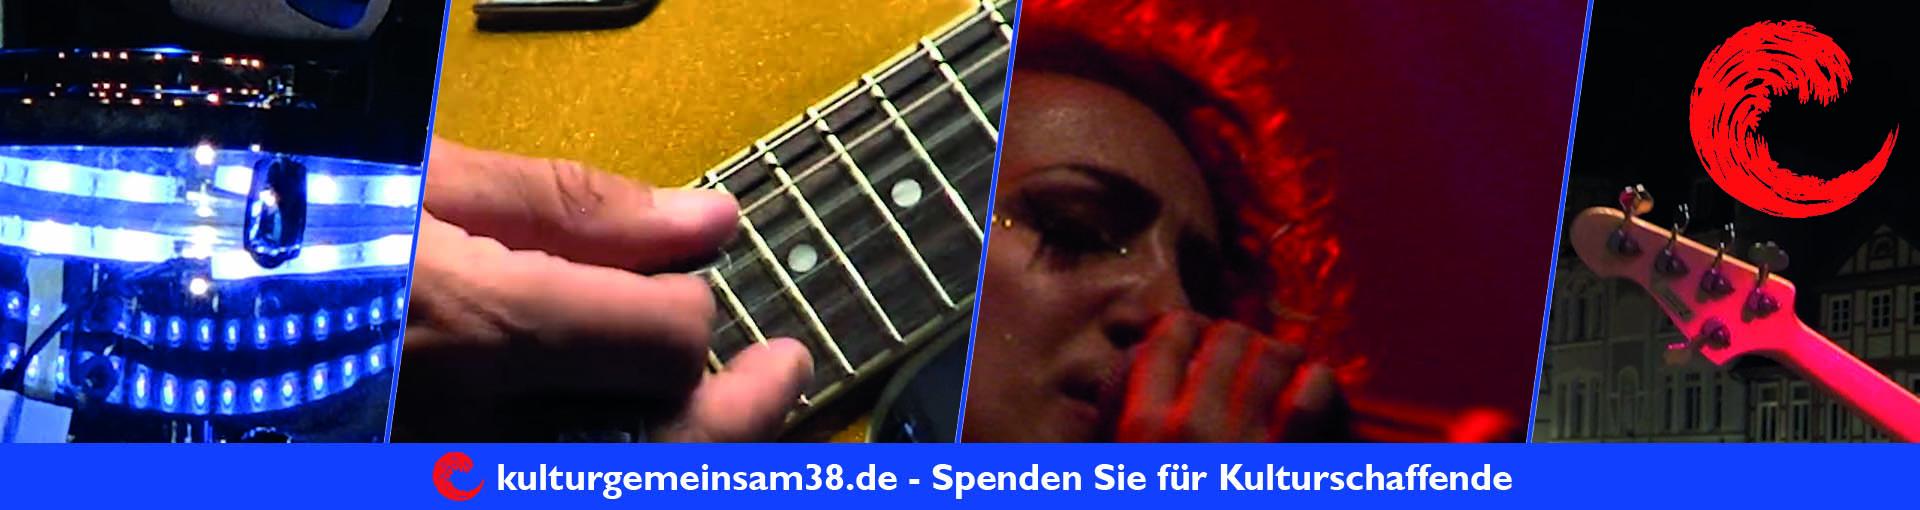 kulturgemeinsam38.de